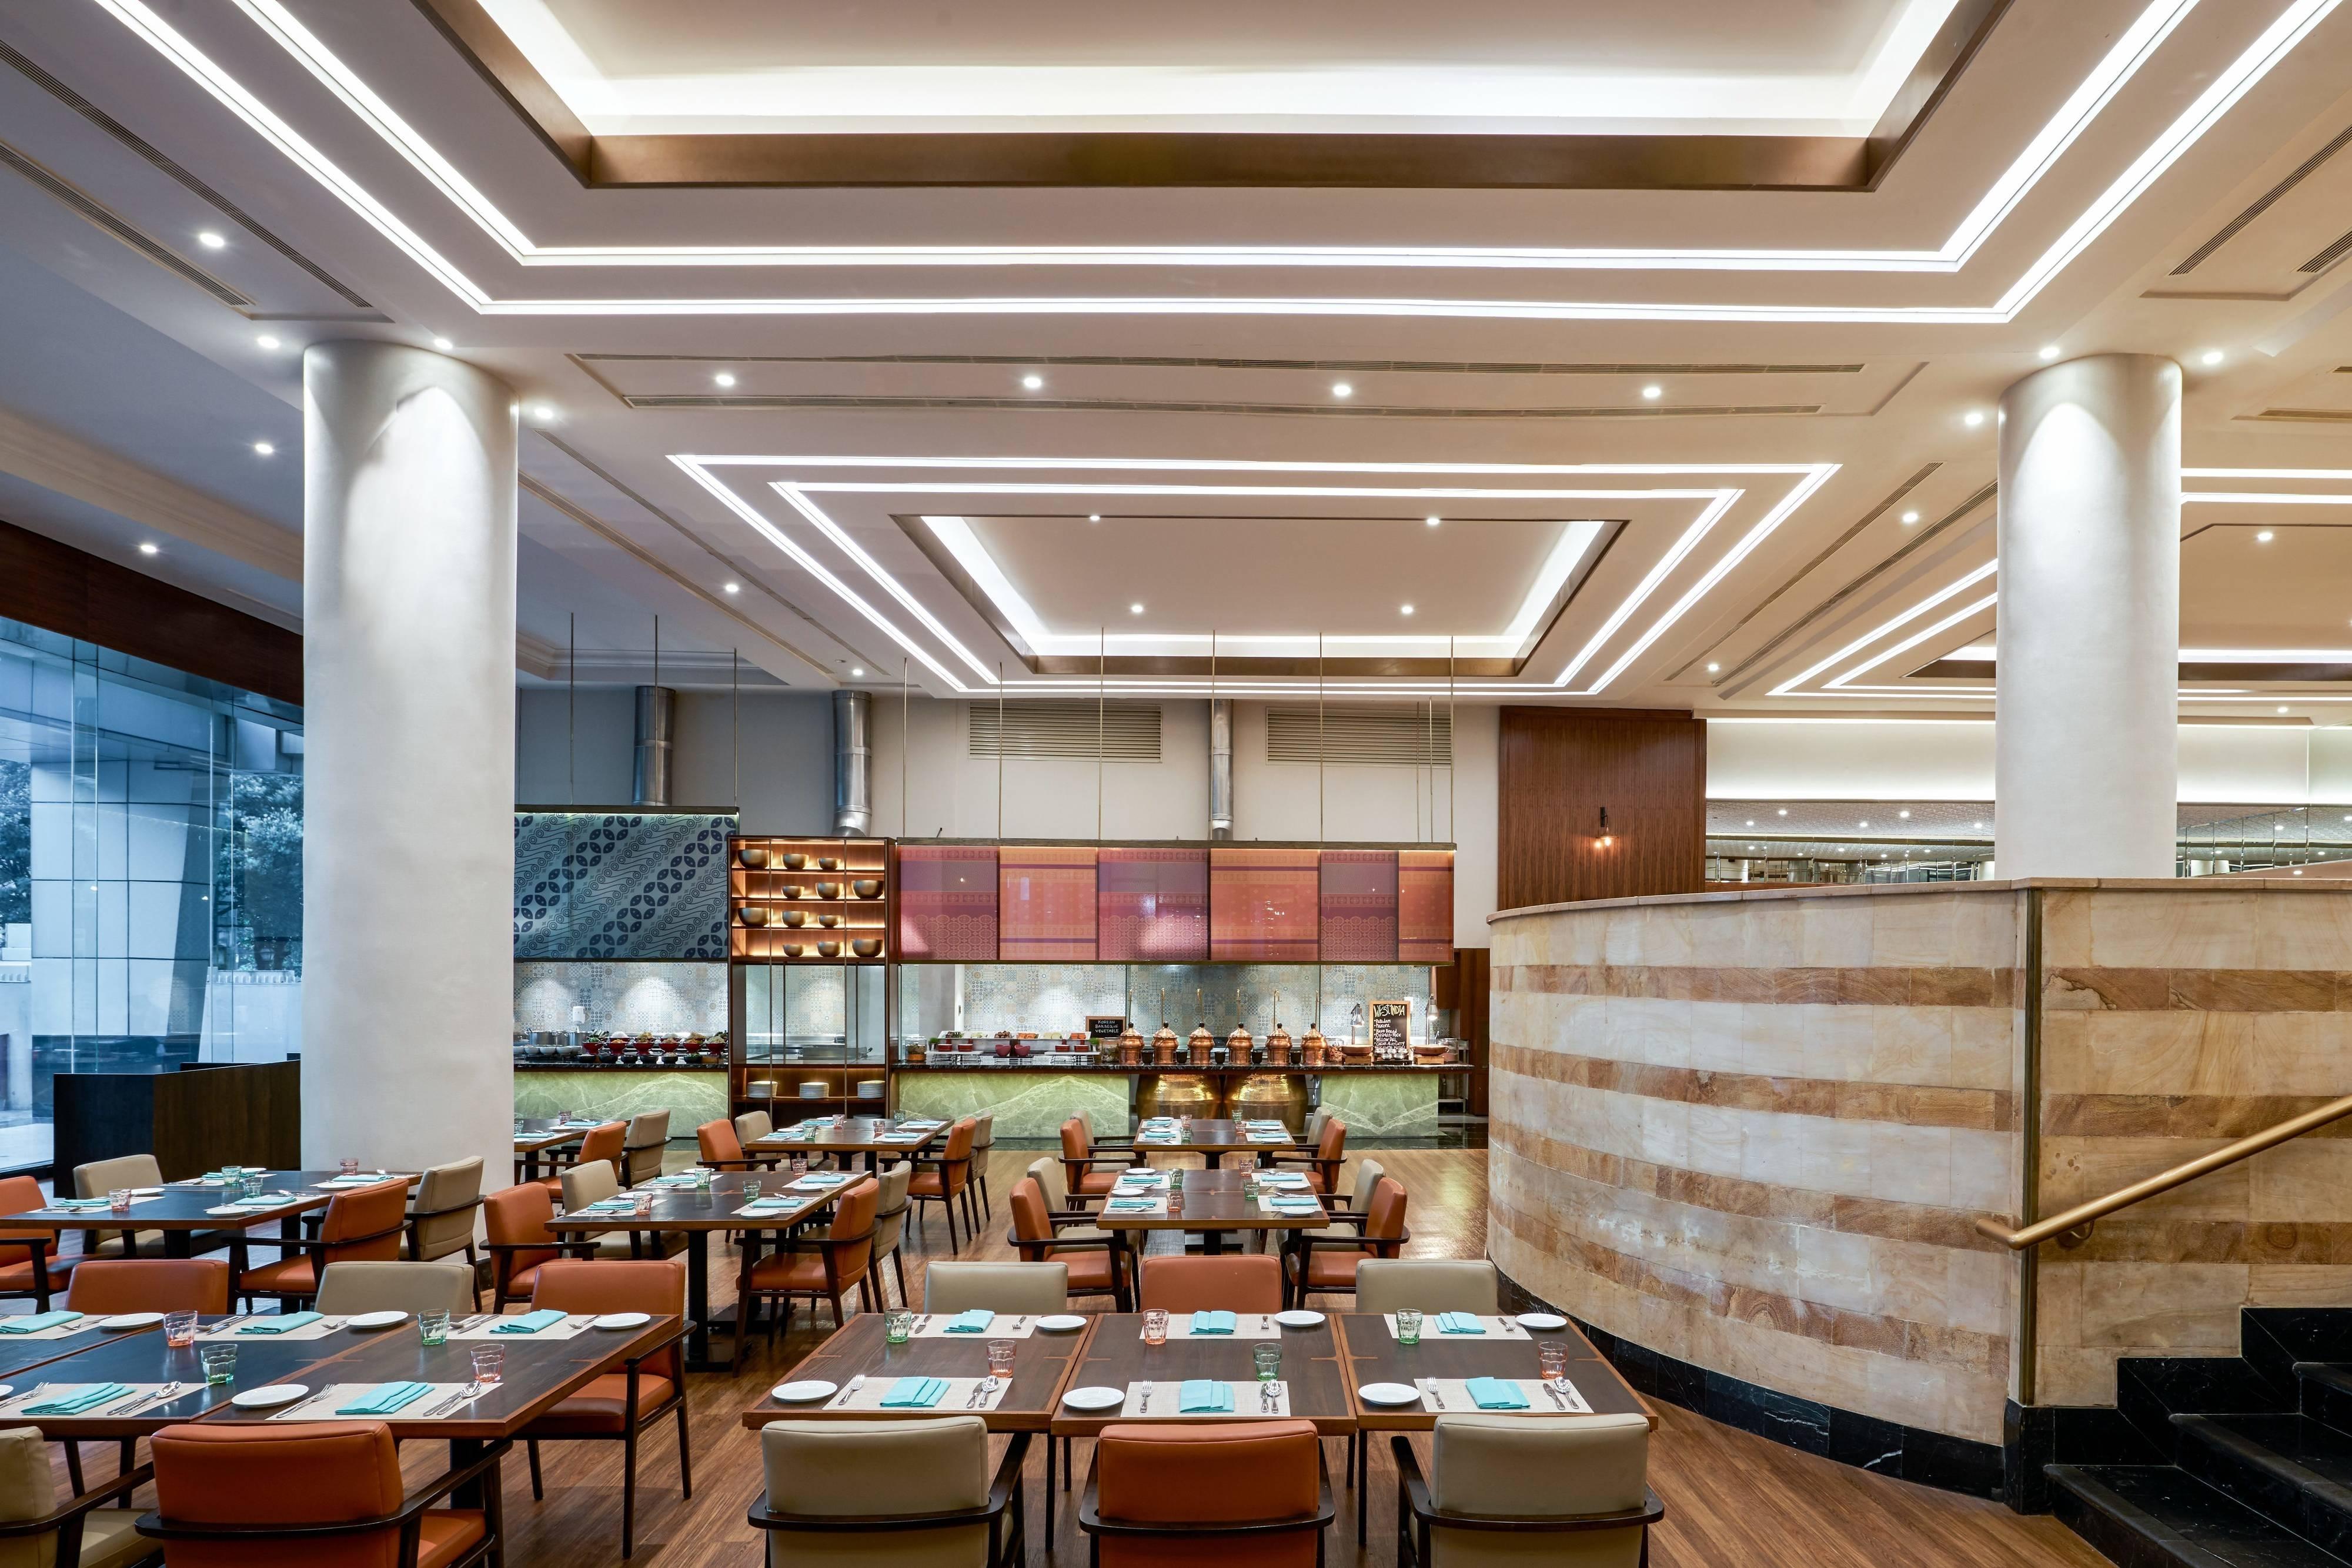 Sailendra - Lower Dining Area